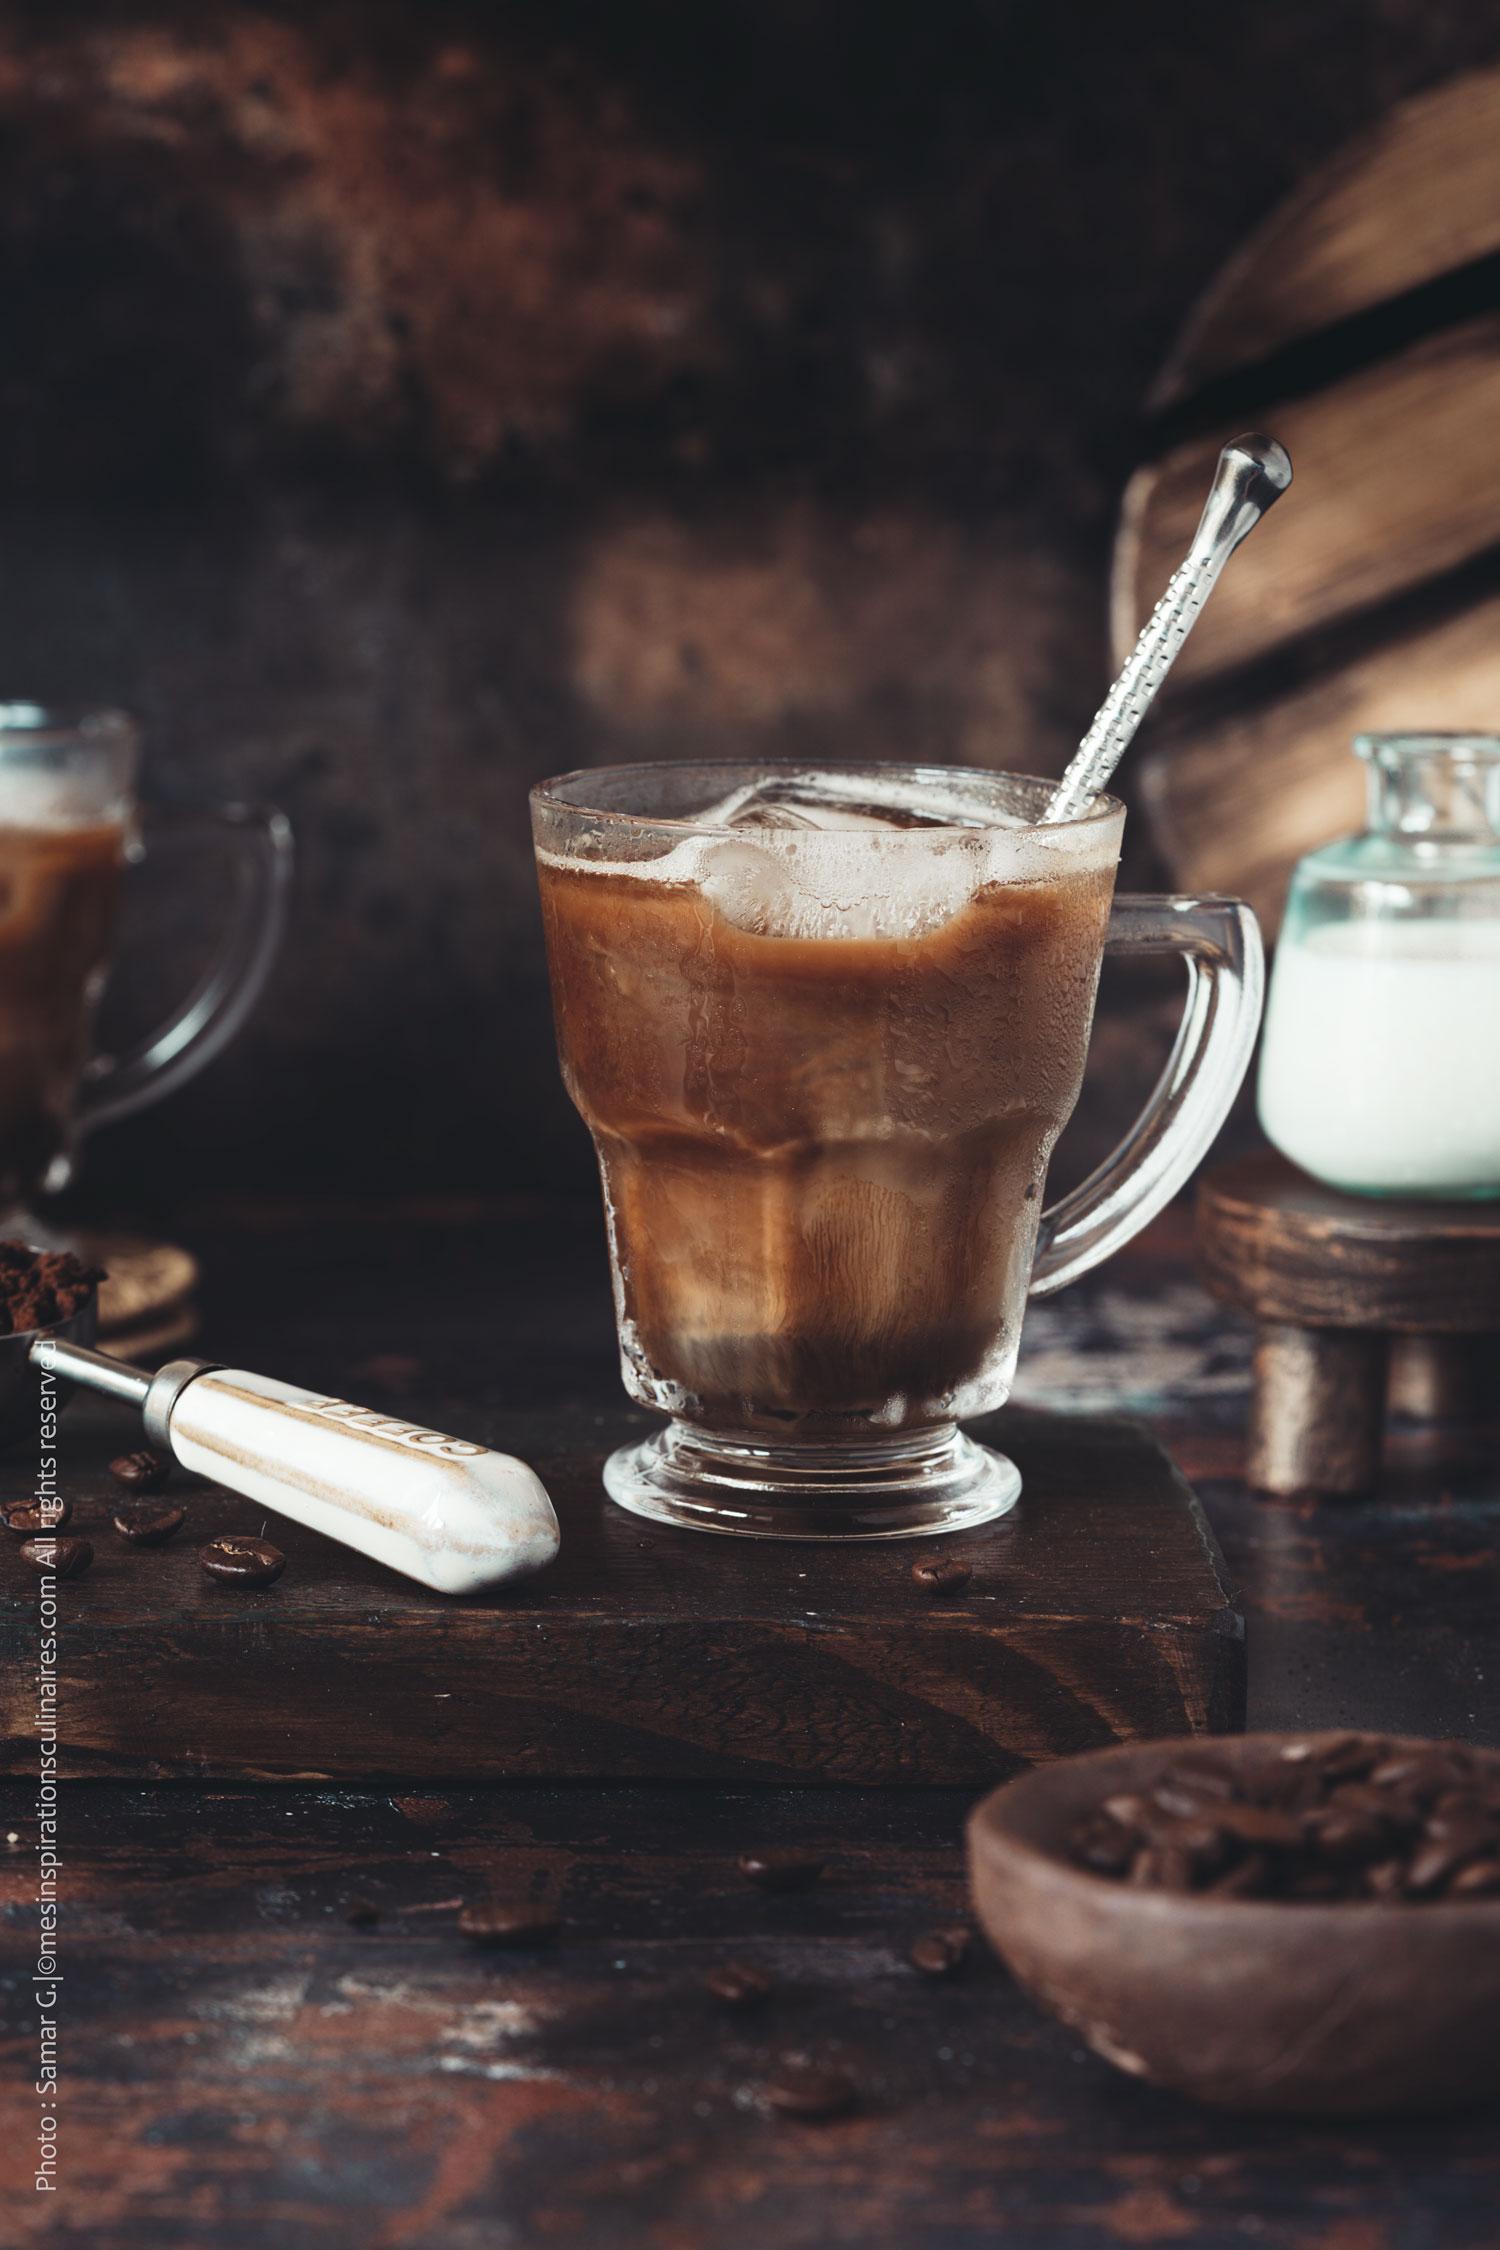 Iced coffee, recette du café glacé américain